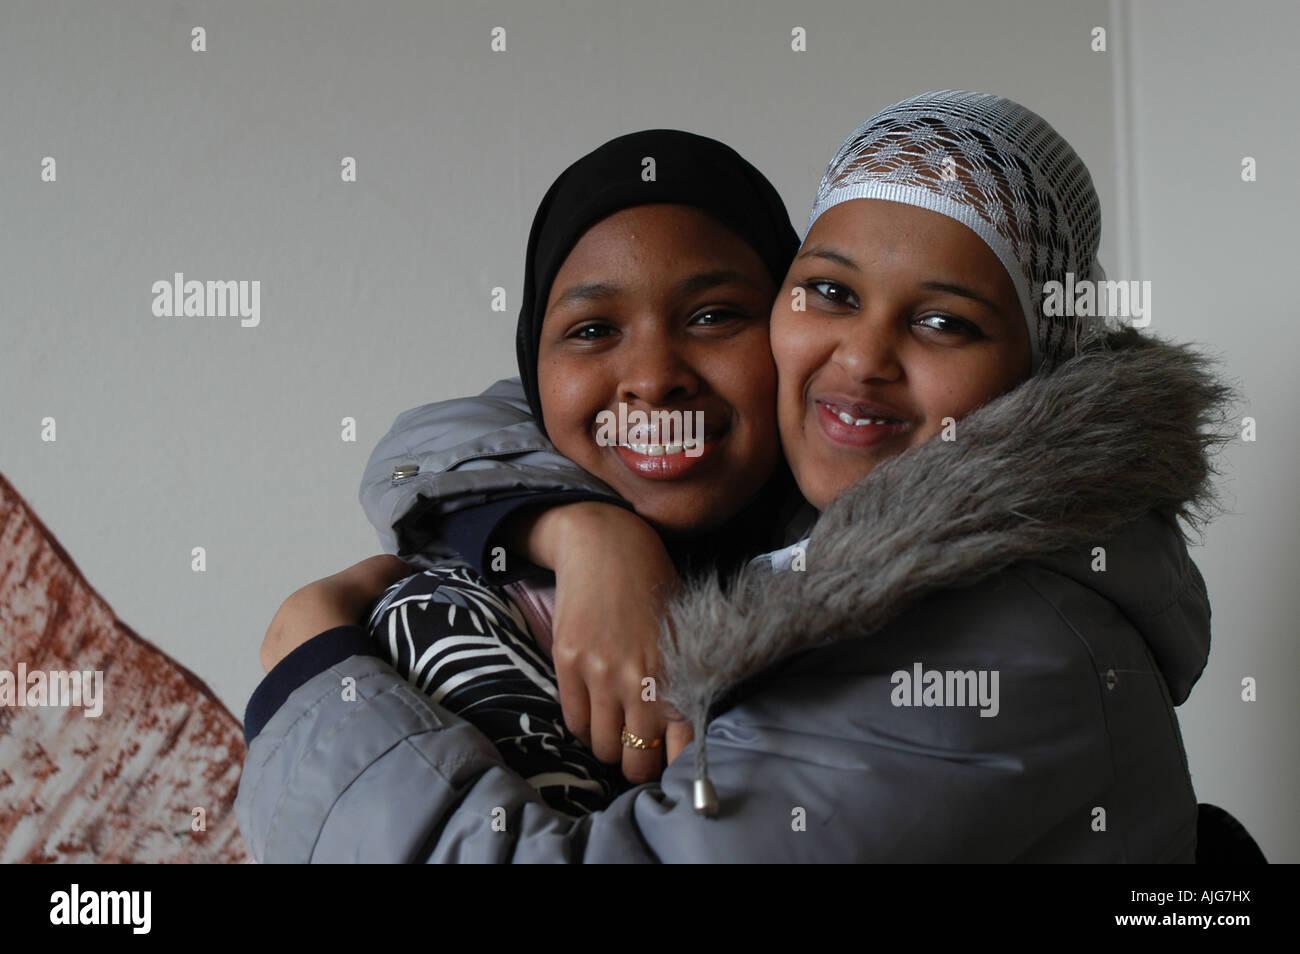 Somali girls London Stock Photo, Royalty Free Image